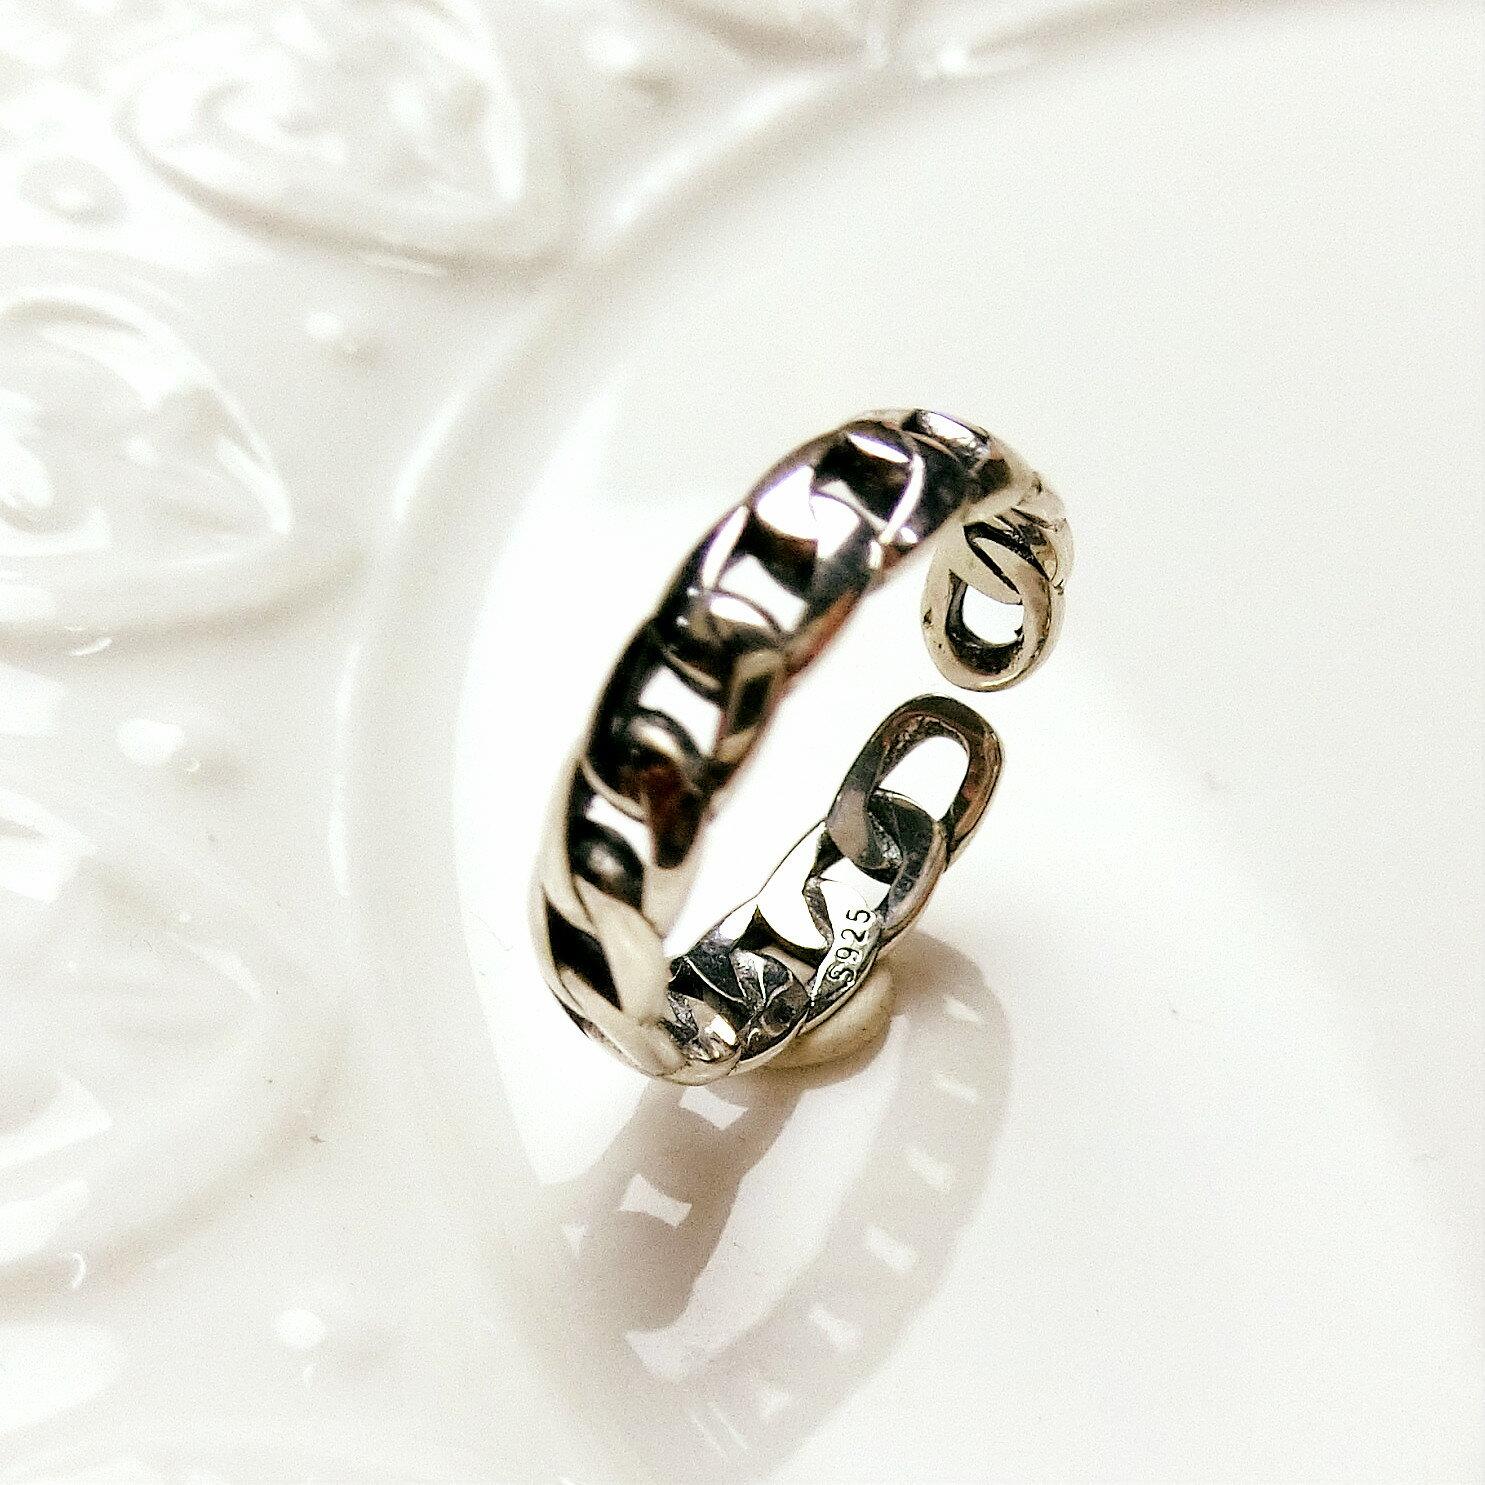 Tokyo Alice 925純銀鍊條開口戒指,戒指飾品首飾銀飾甜美(sr0000014)